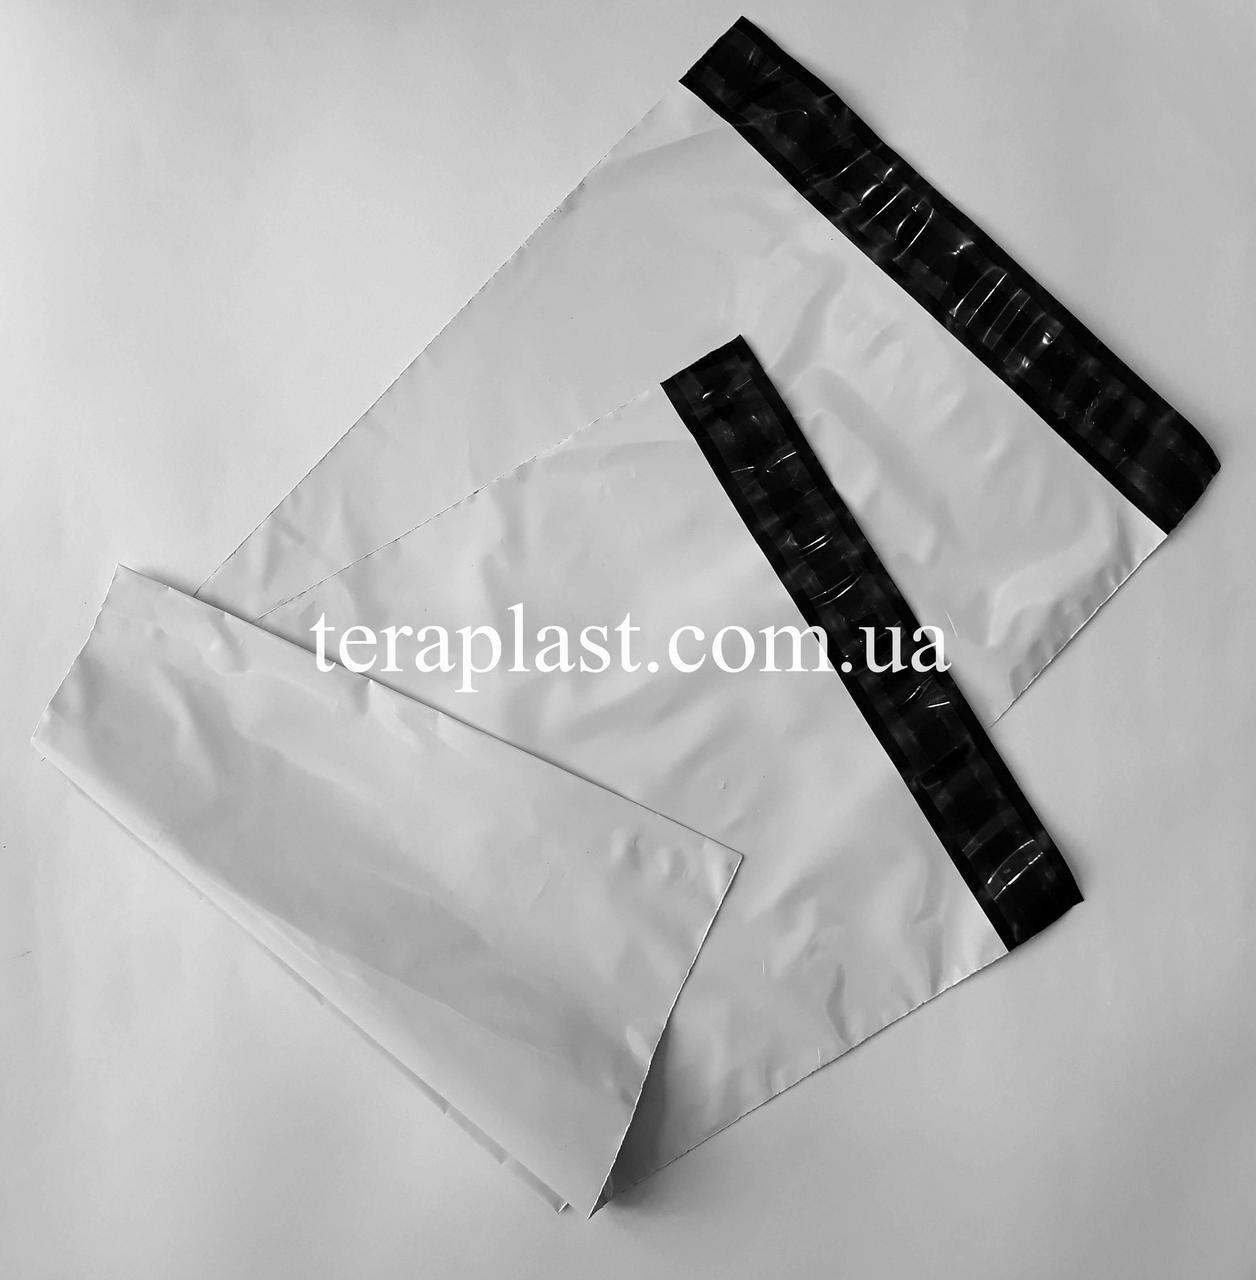 Курьерские пакеты (А6) 125 х 190 + 40 мм без кармана (100шт)